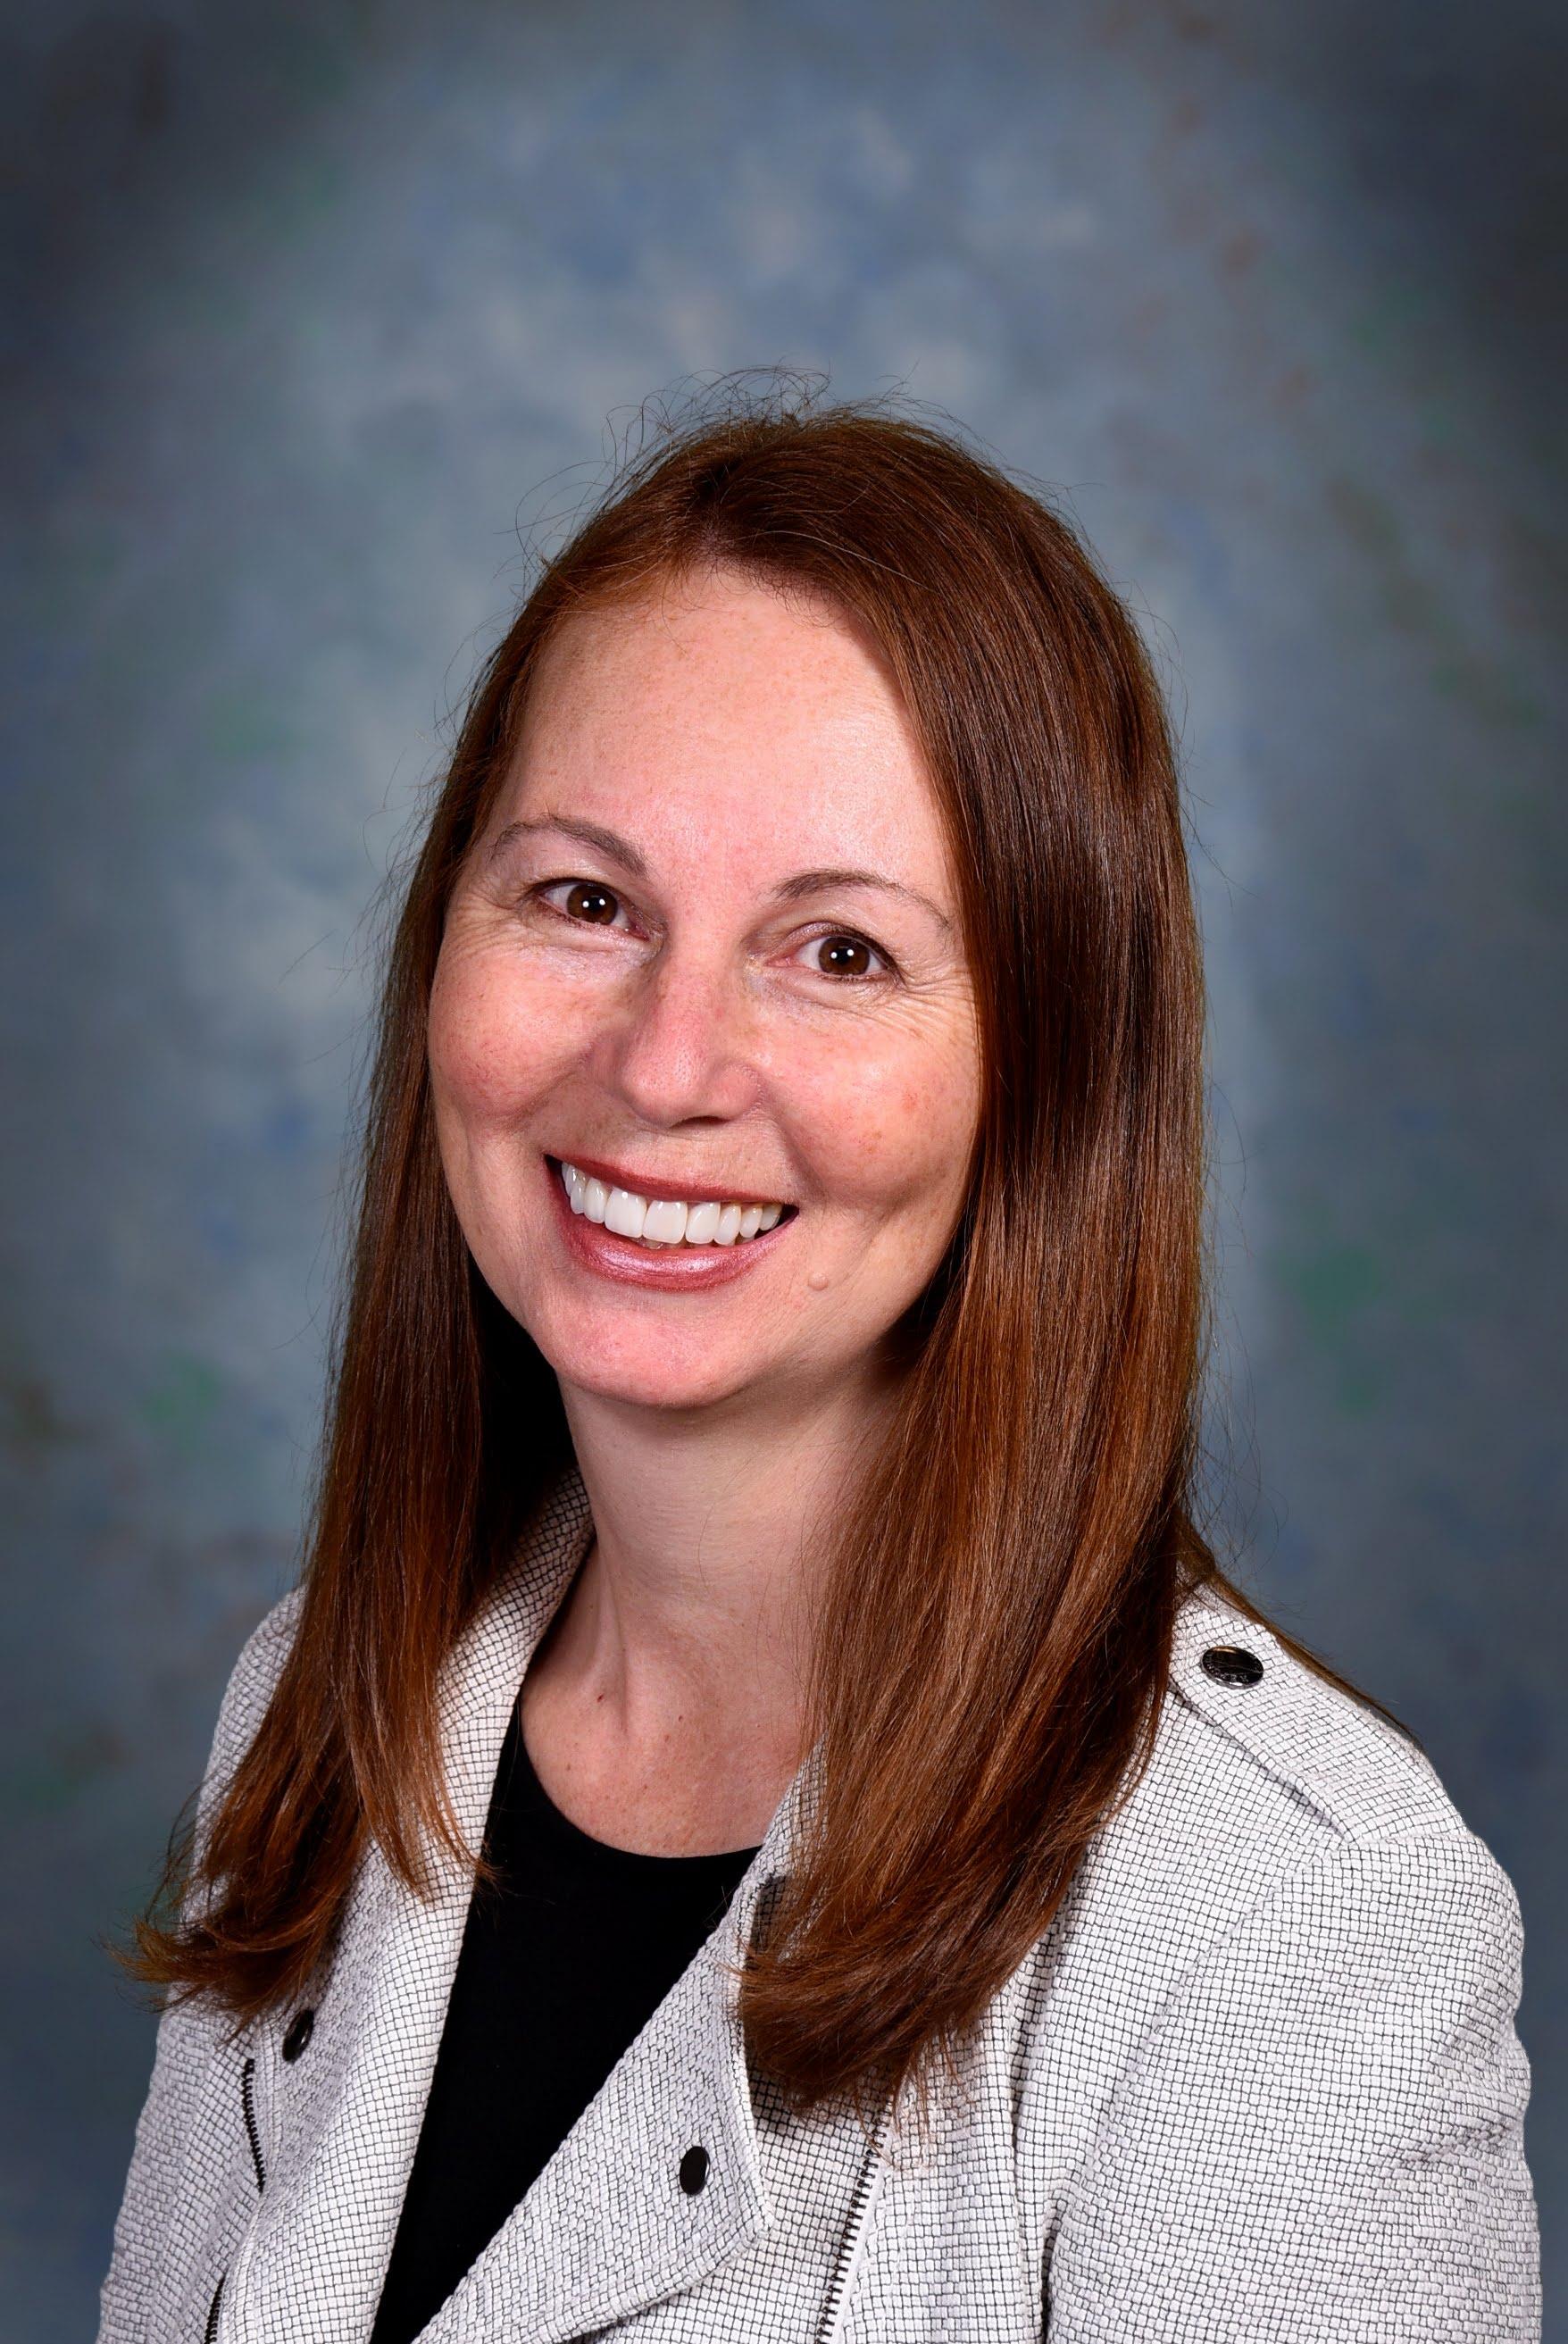 Amanda Scroggs, Director of Communications